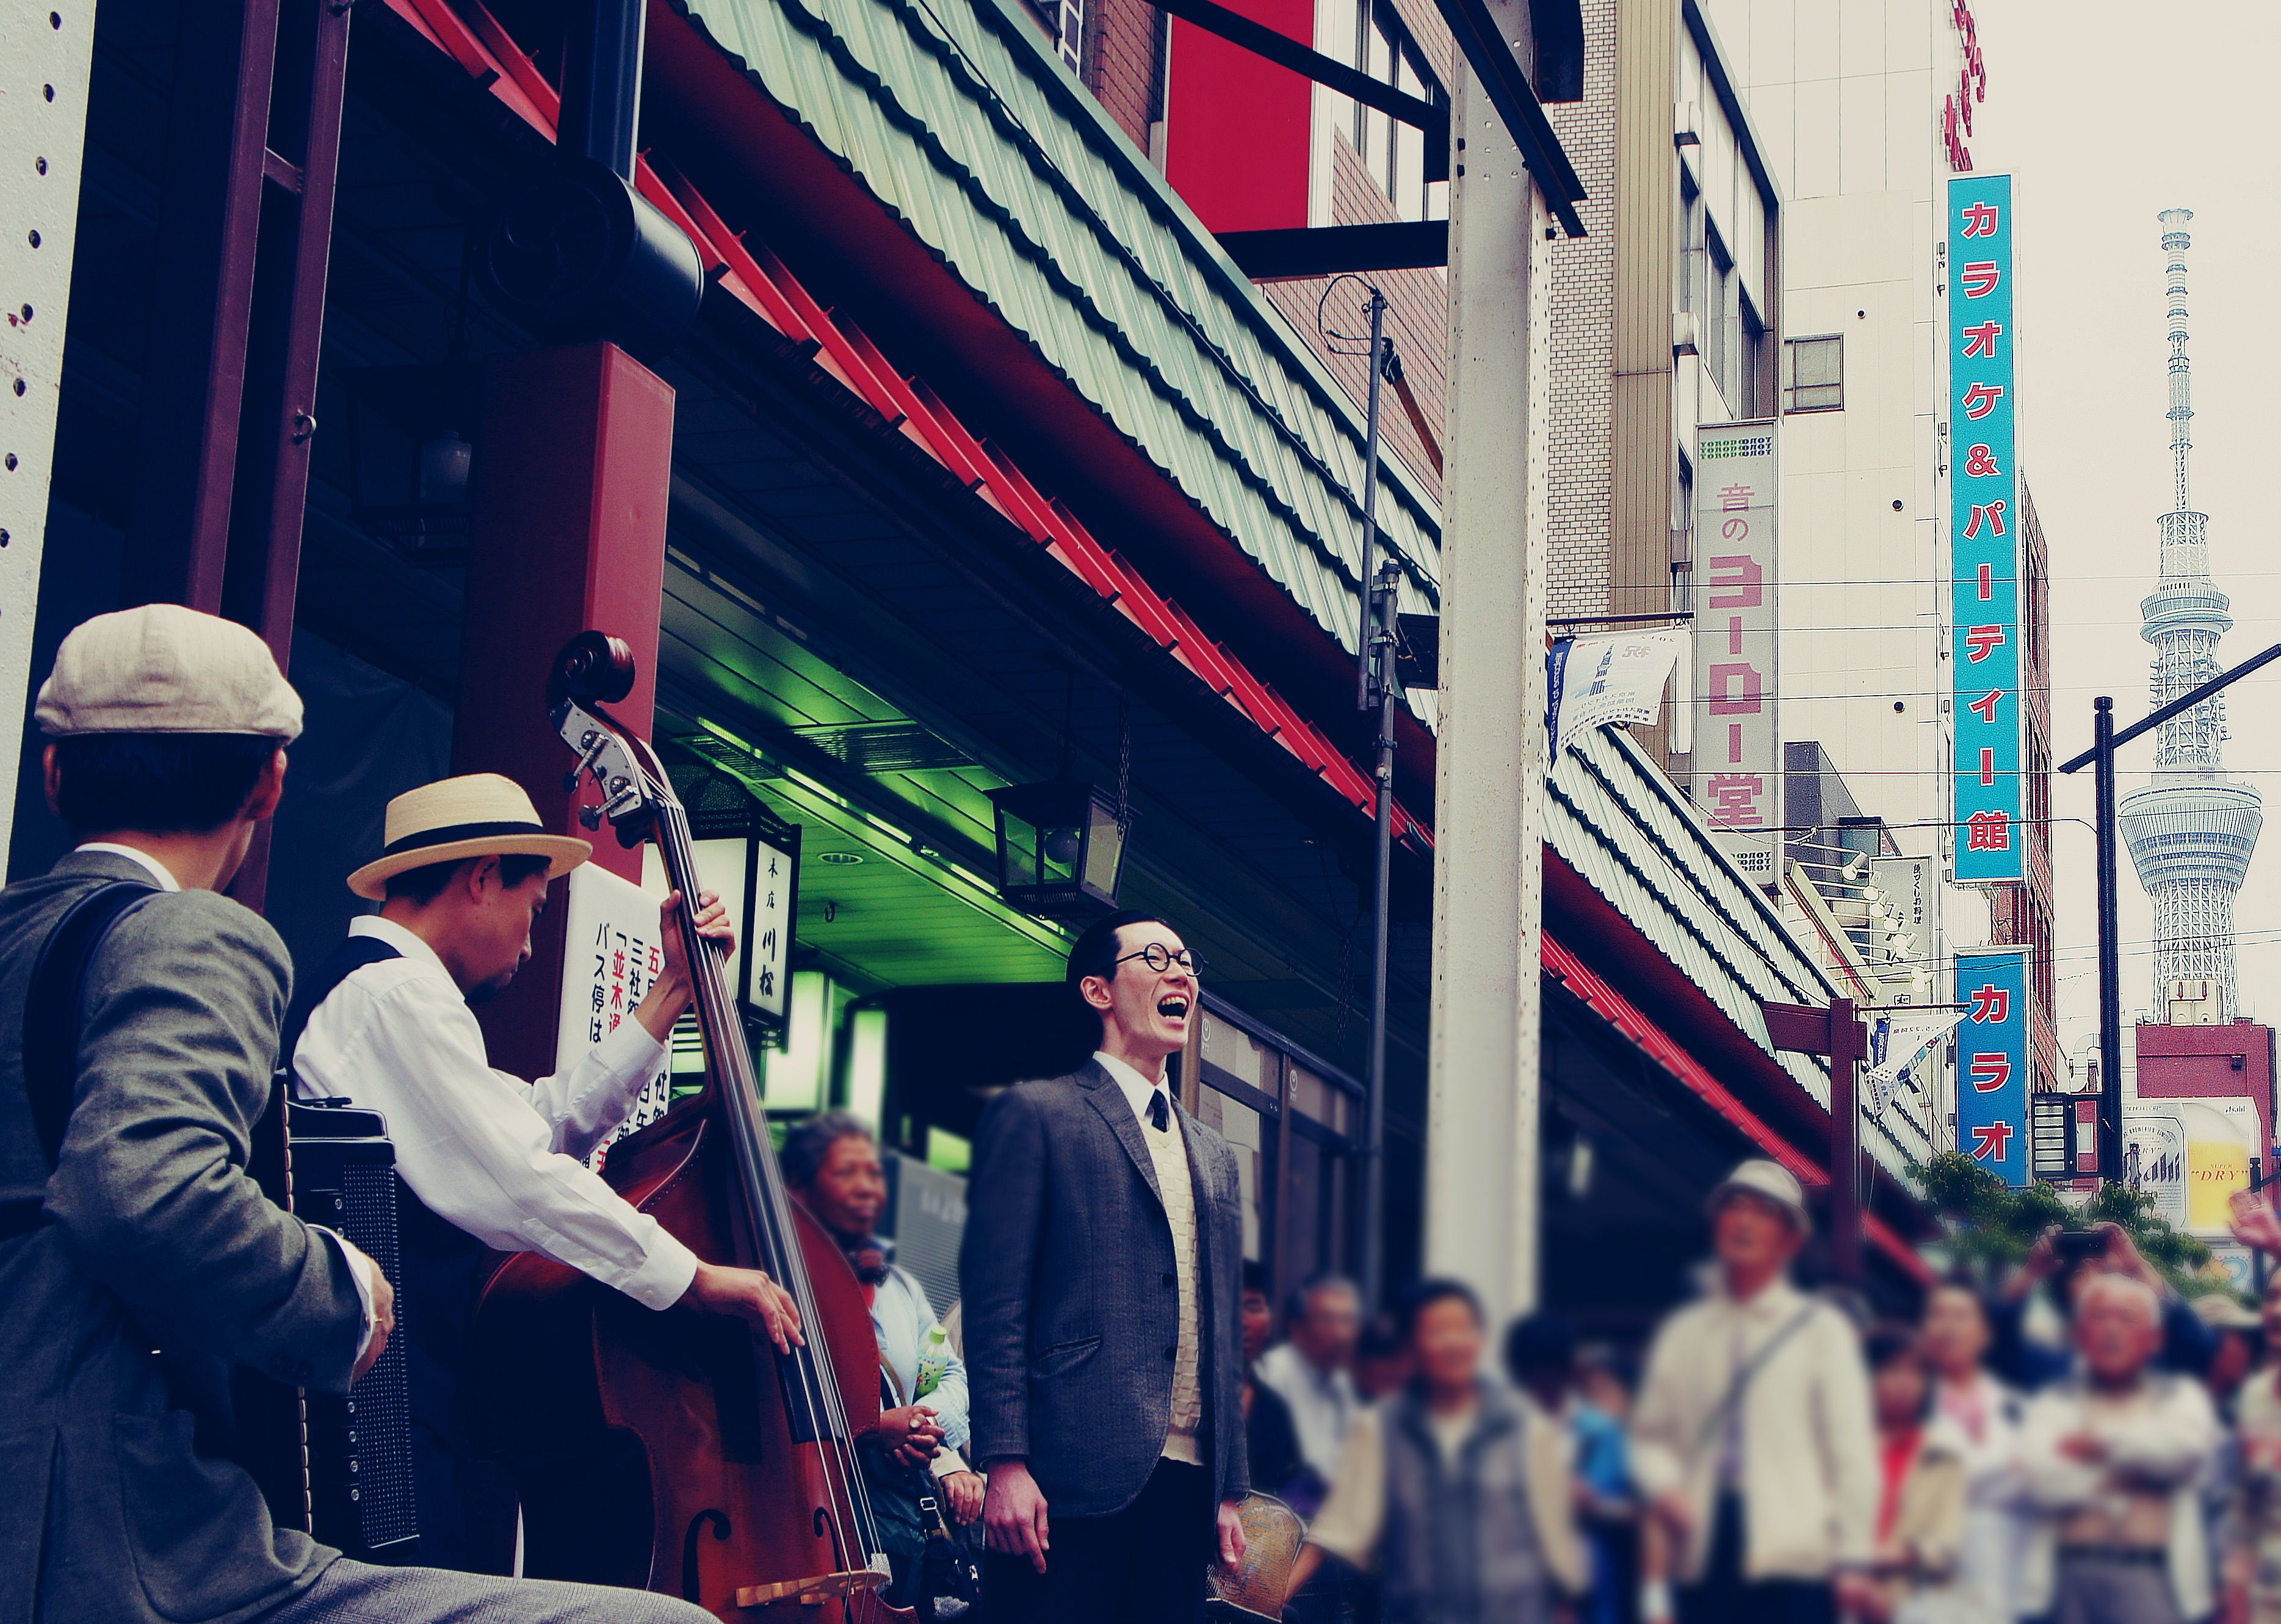 #Japan #Tokyo #Asakusa #Sanja_Matsuri #skytree